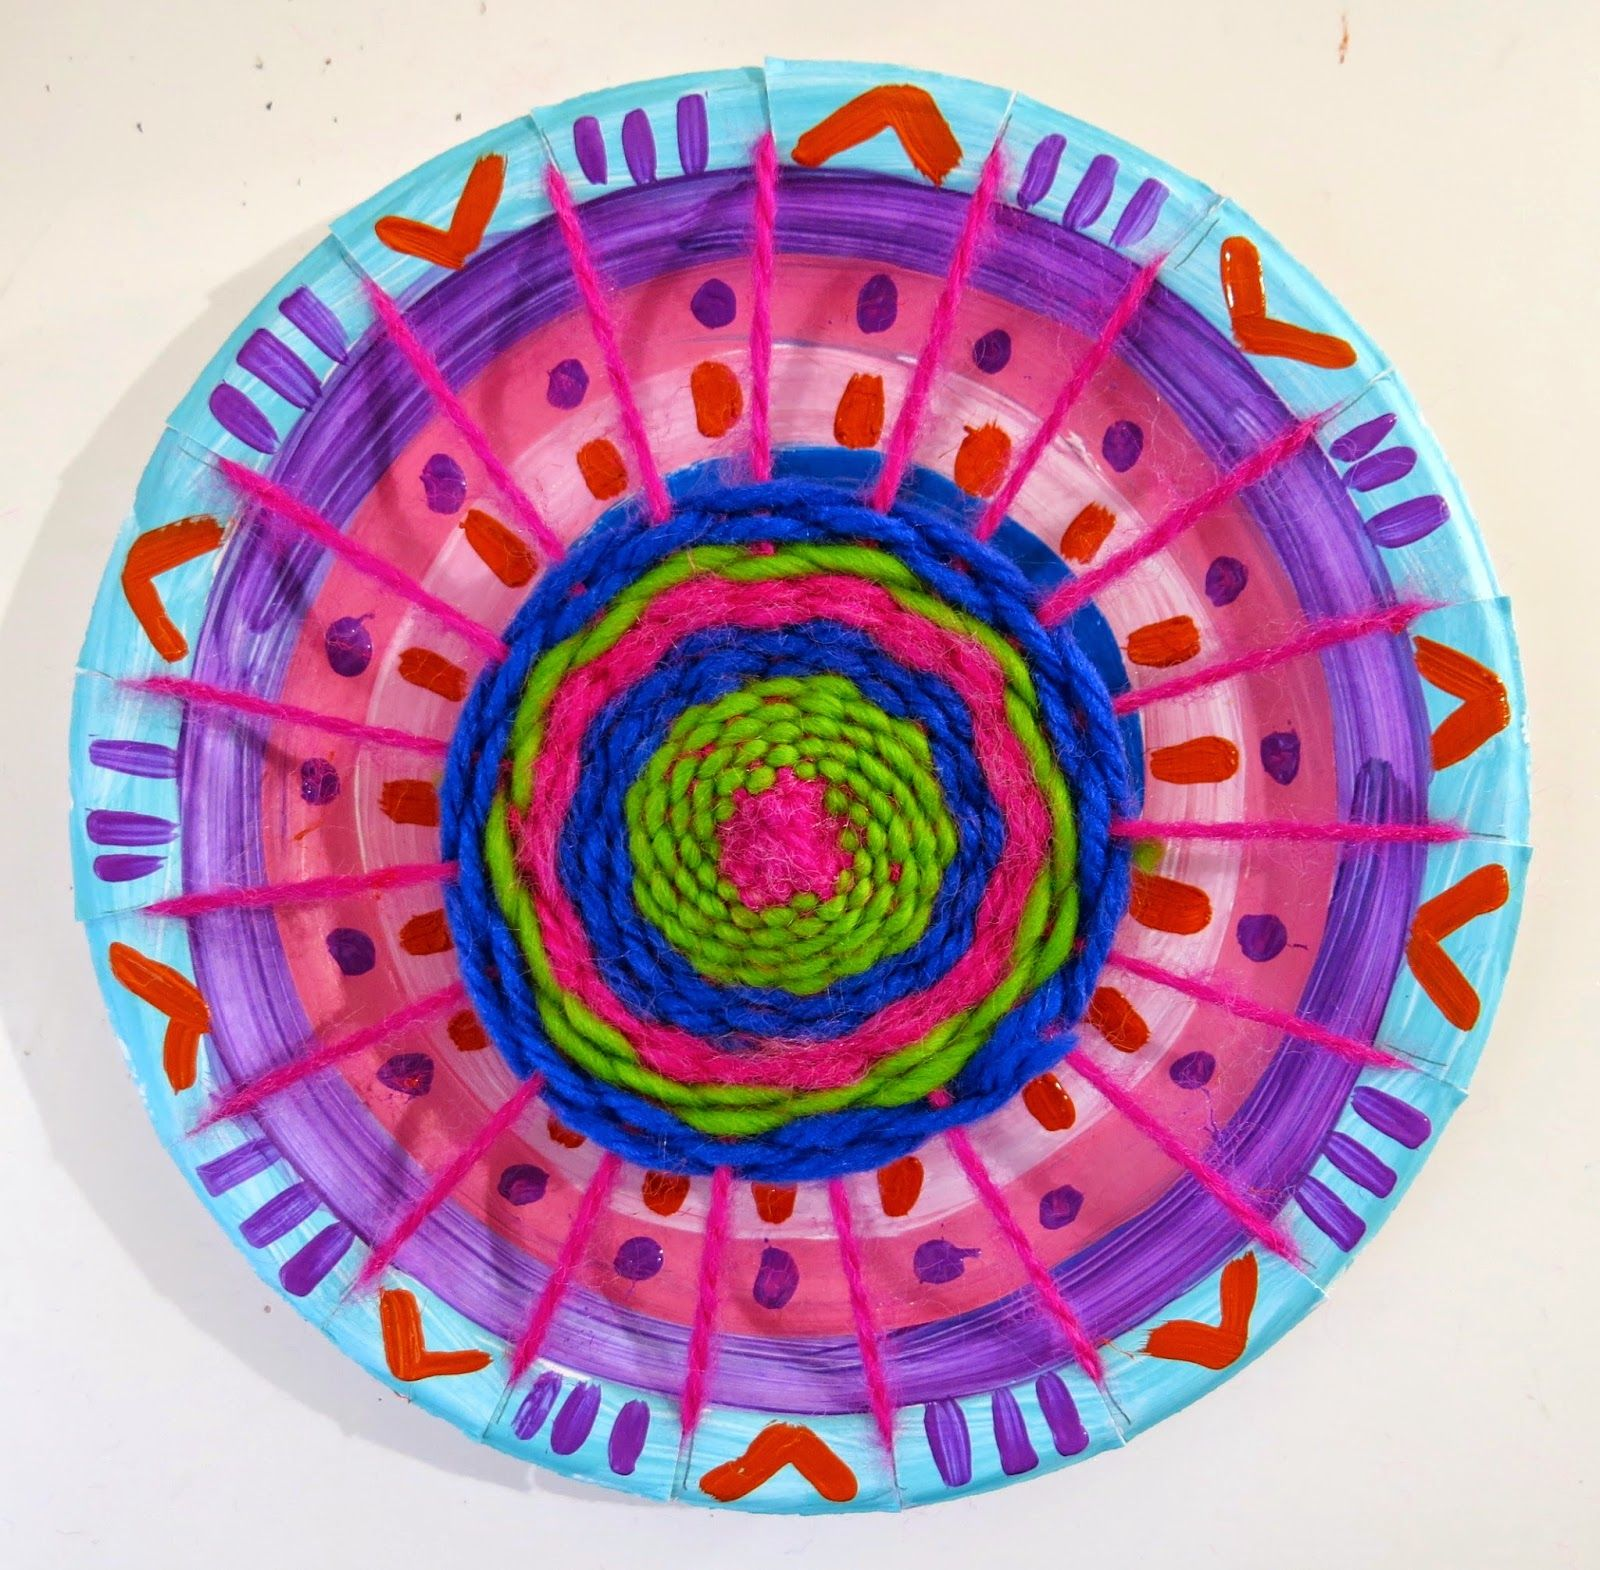 Navajo Art Projects Middle School